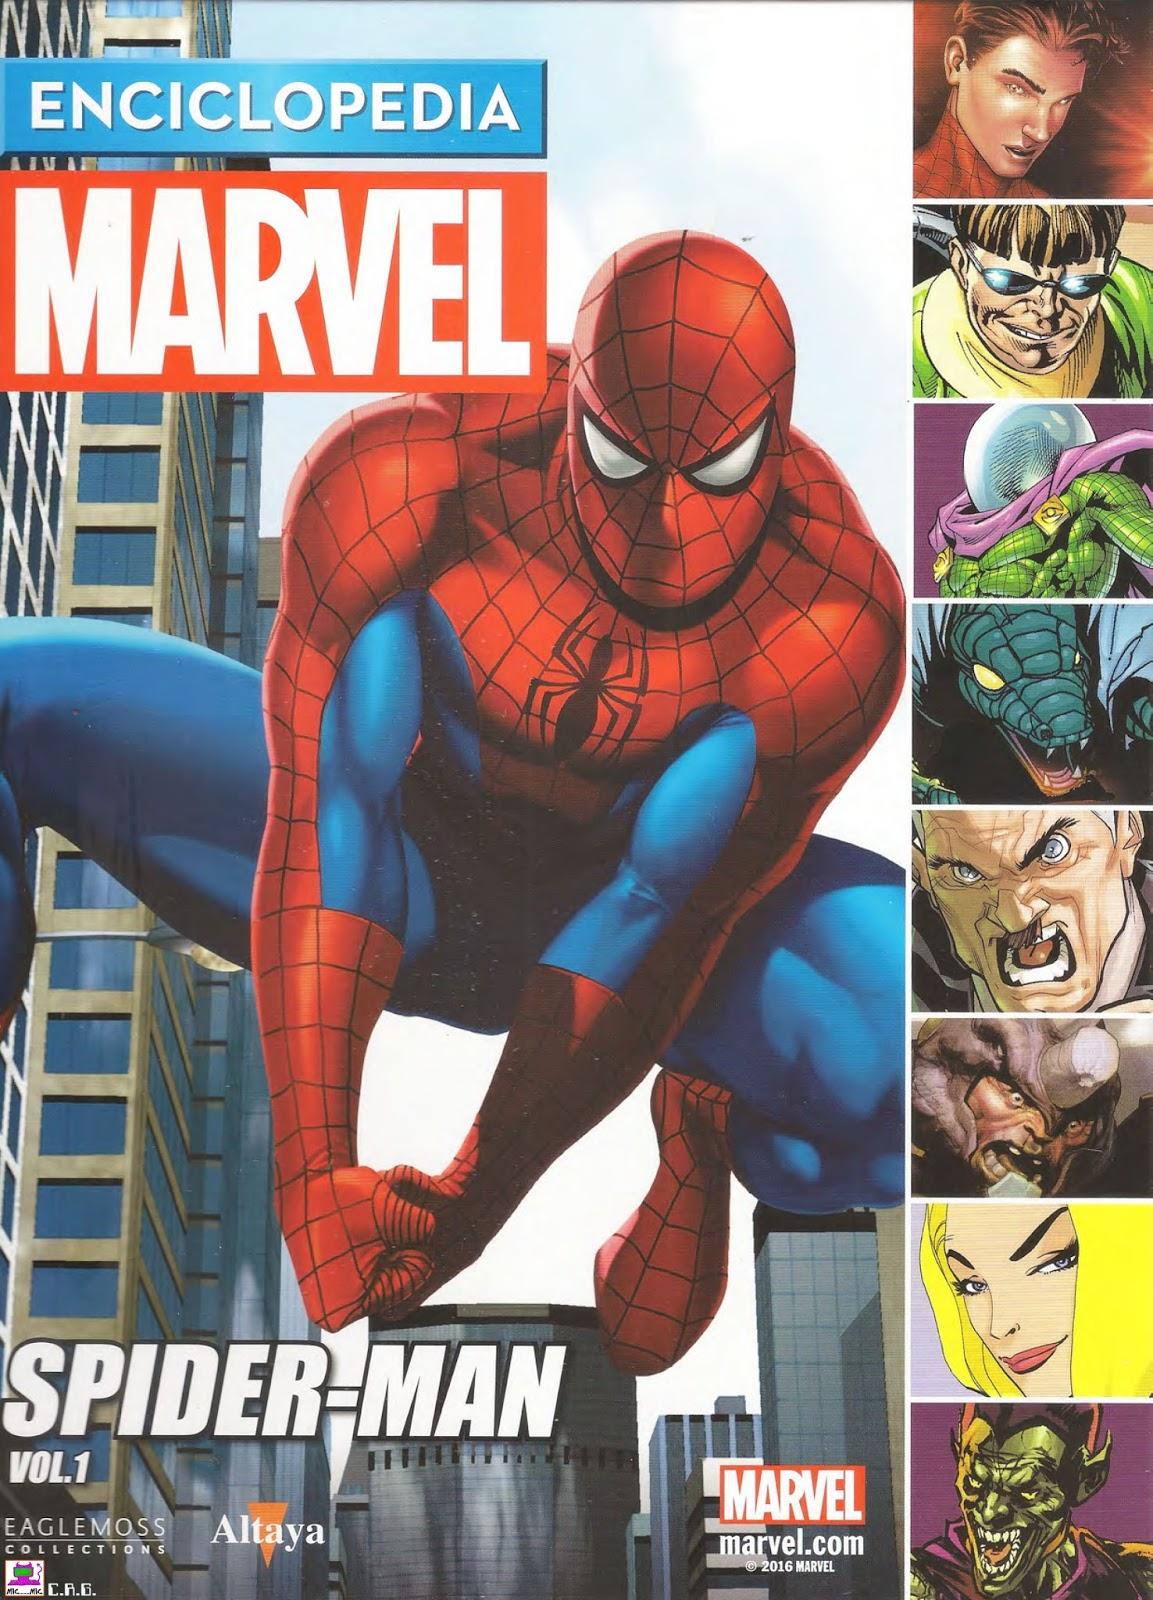 Enciclopedia marvel spiderman pdf editorial altaya identi - Marvel spiderman comics pdf ...